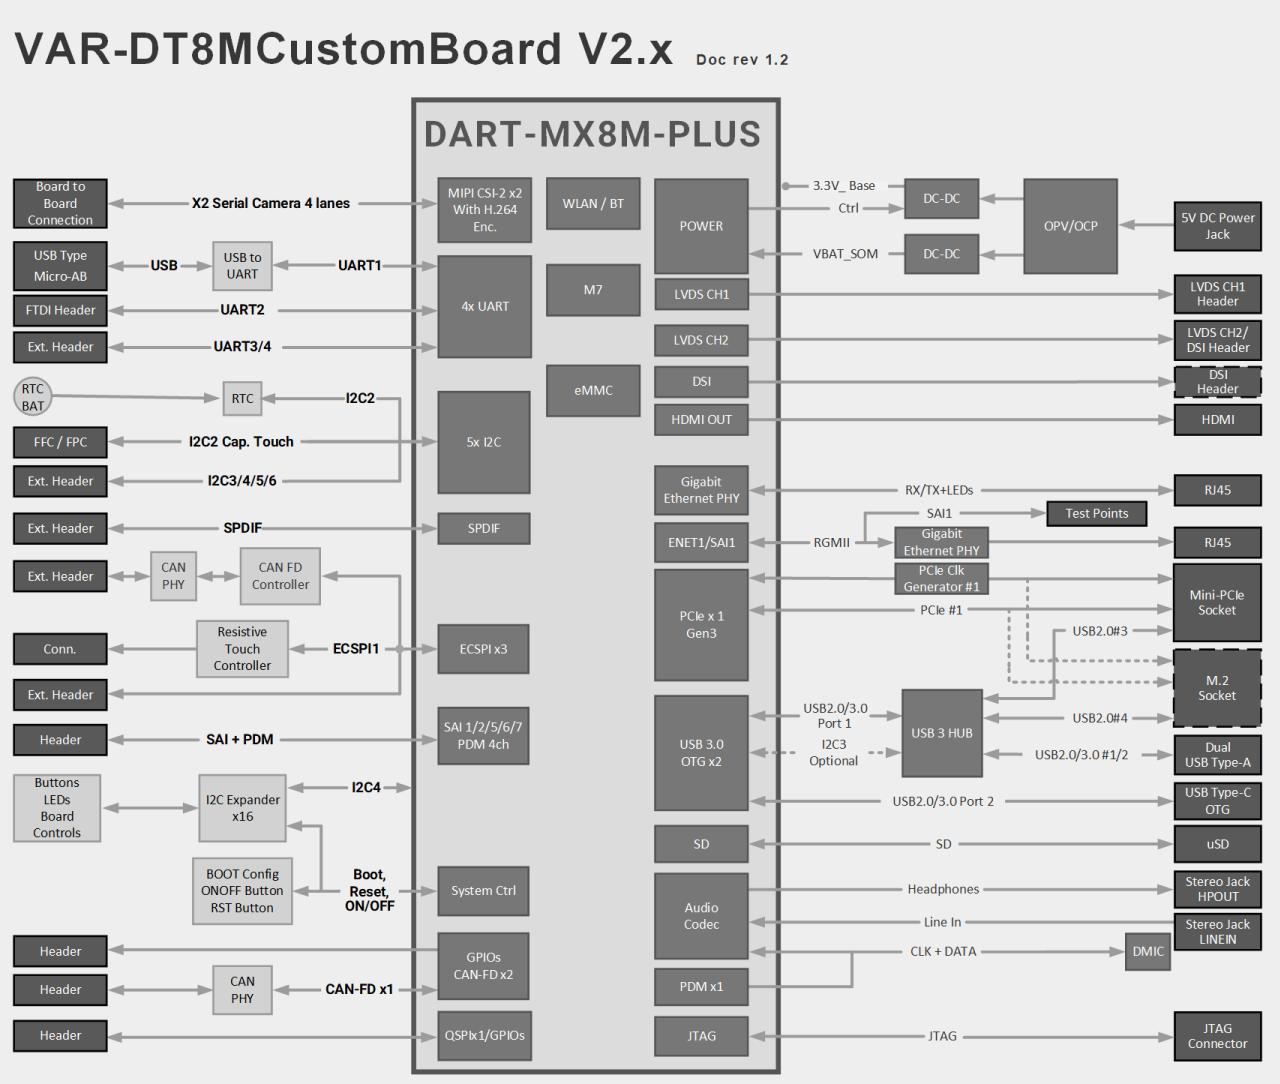 VAR-DT8MCustomBoard with DART-MX8M-PLUS Block Diagram Diagram